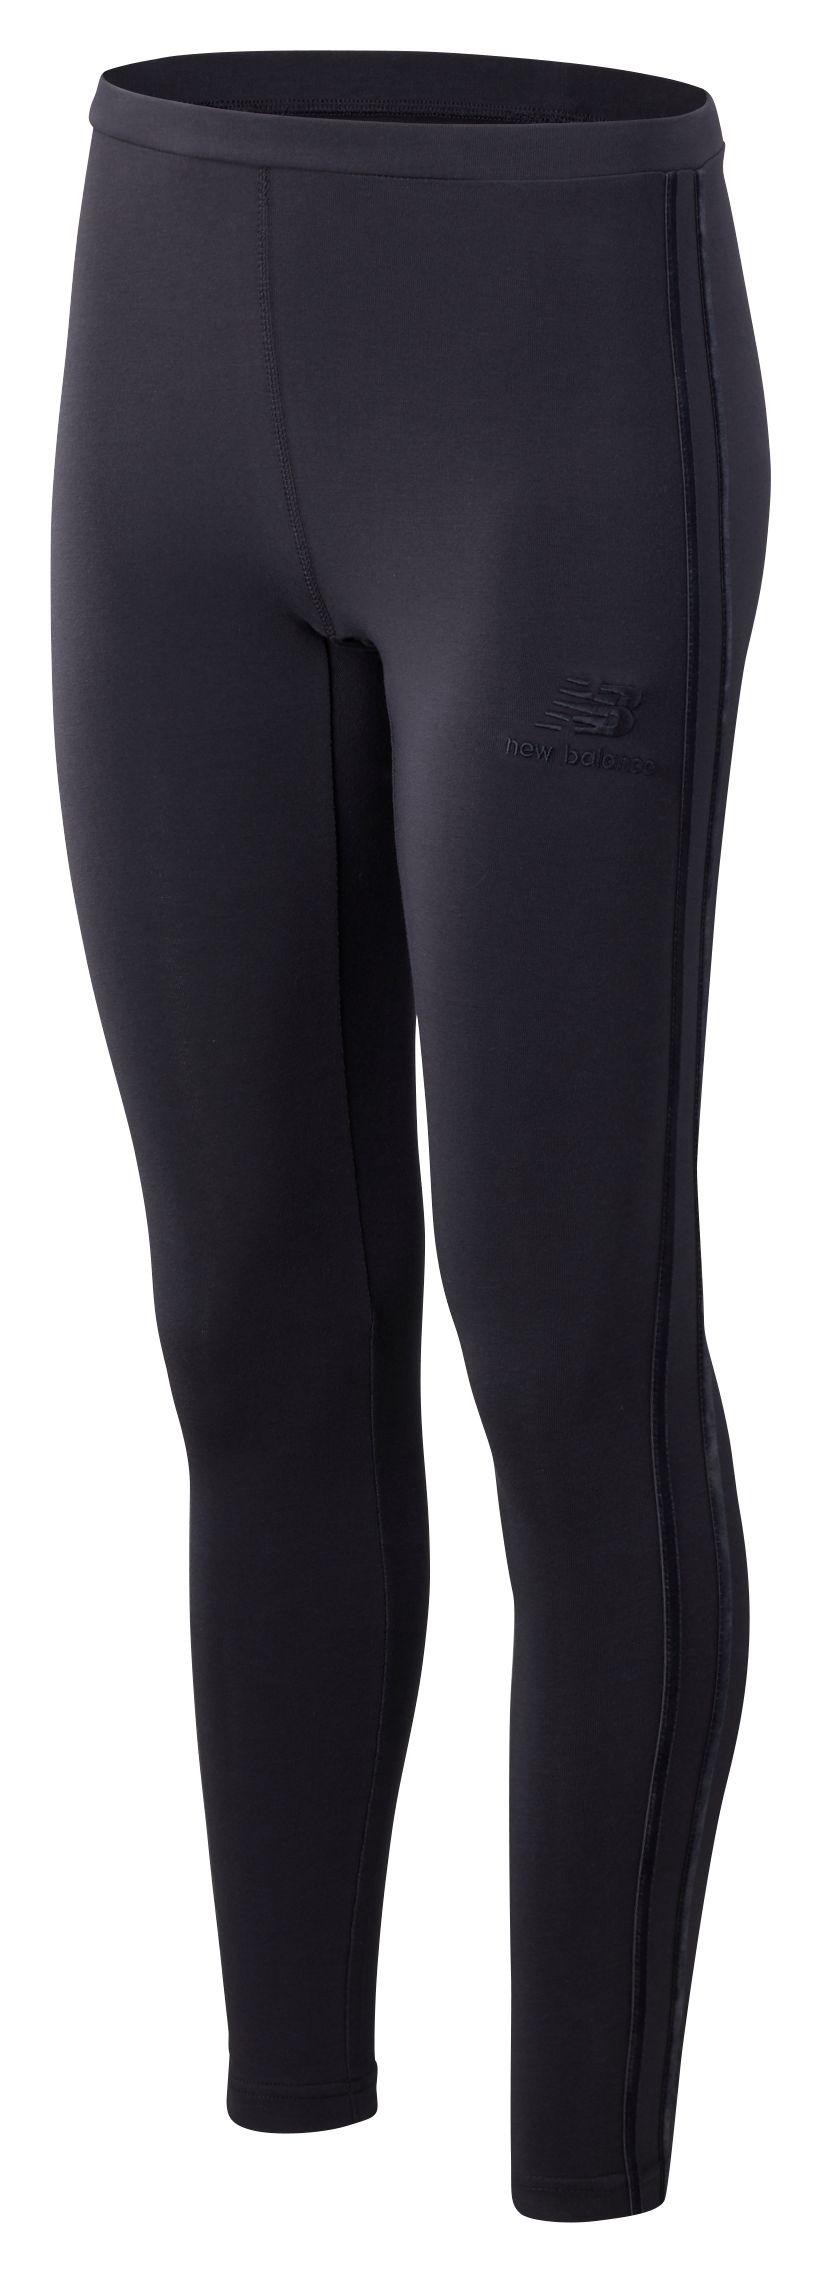 Women's Essentials Opulence Legging